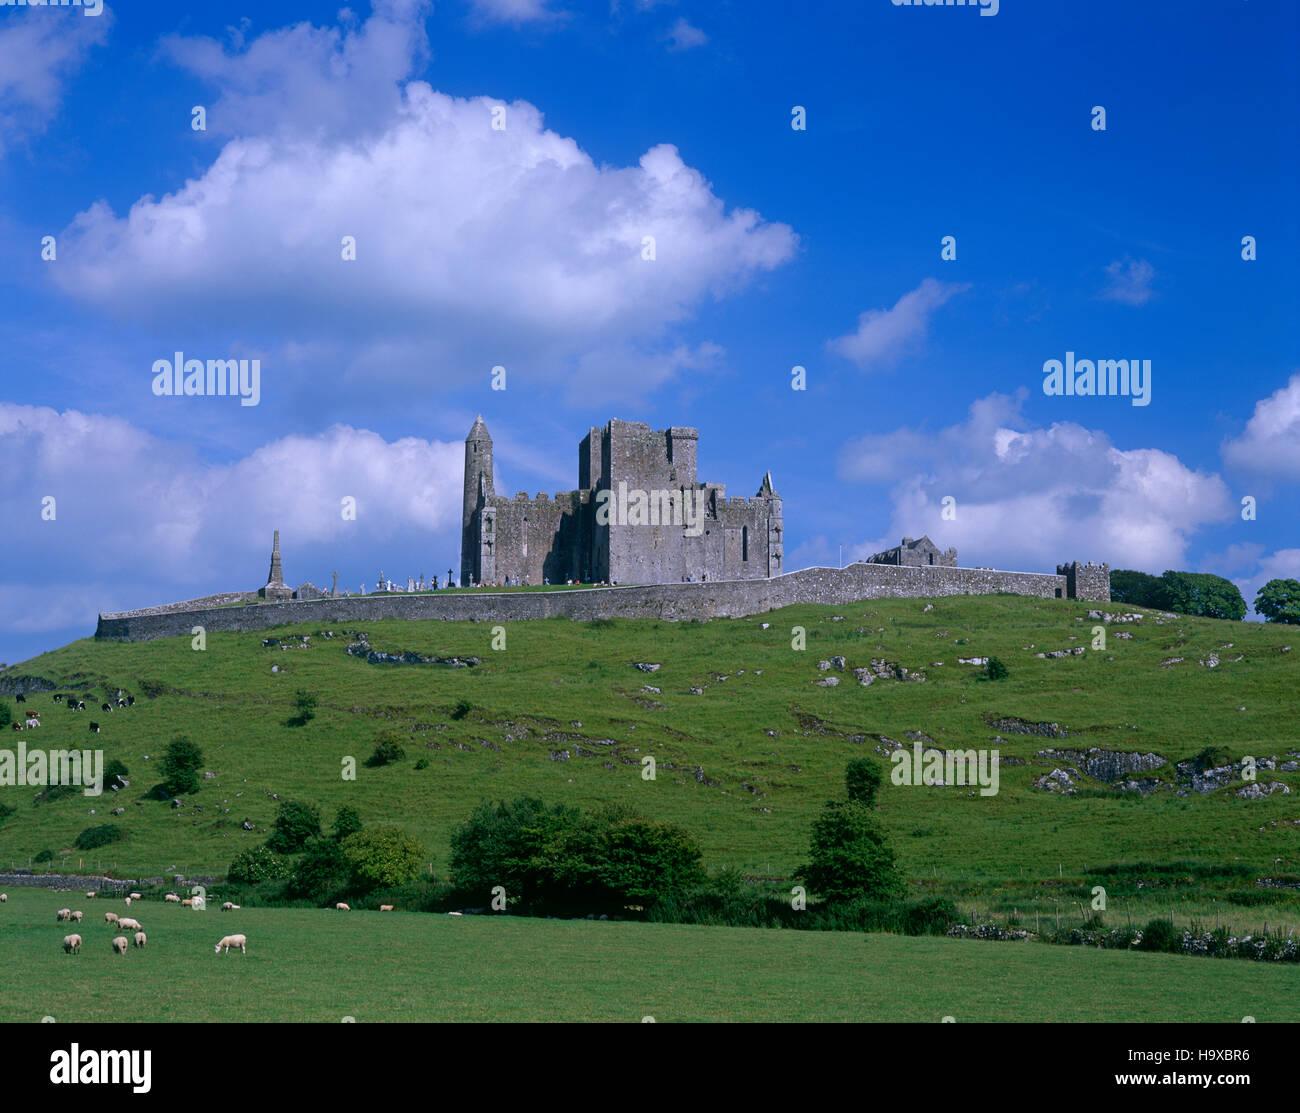 Rock of Cashel, County Tipperary, Ireland - Stock Image